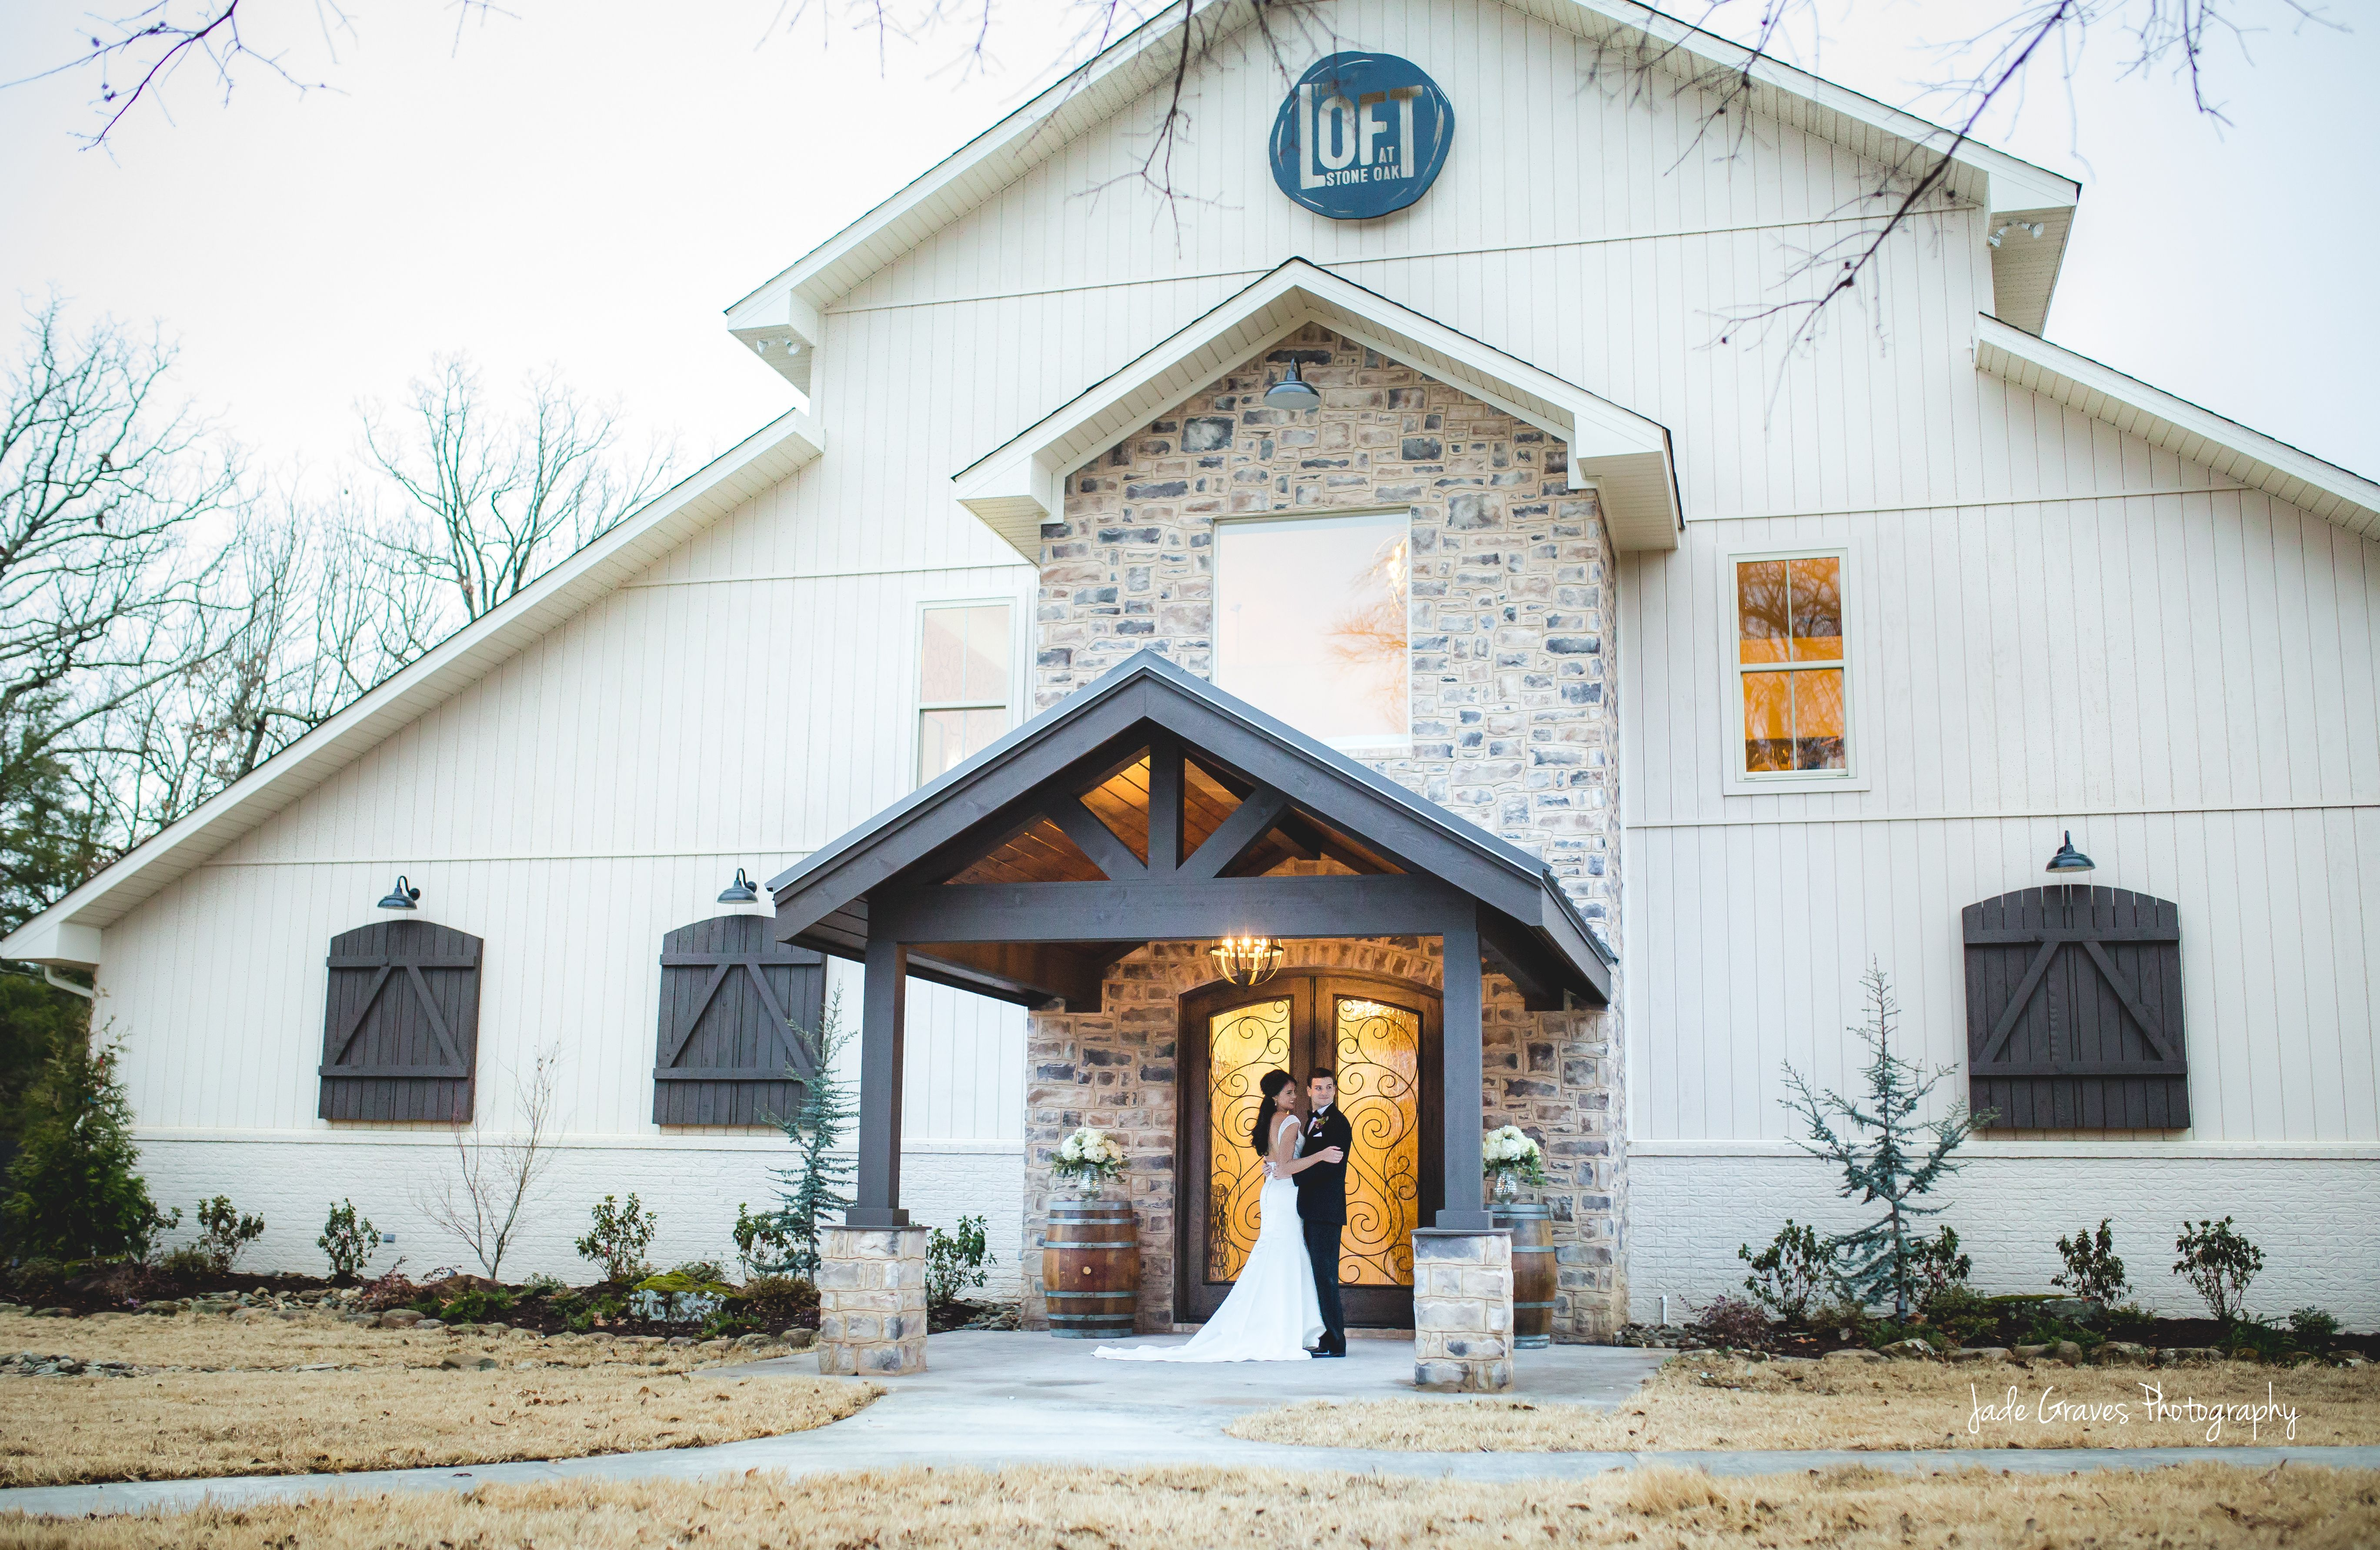 Arkansas wedding venue the loft at stone oak arkansas